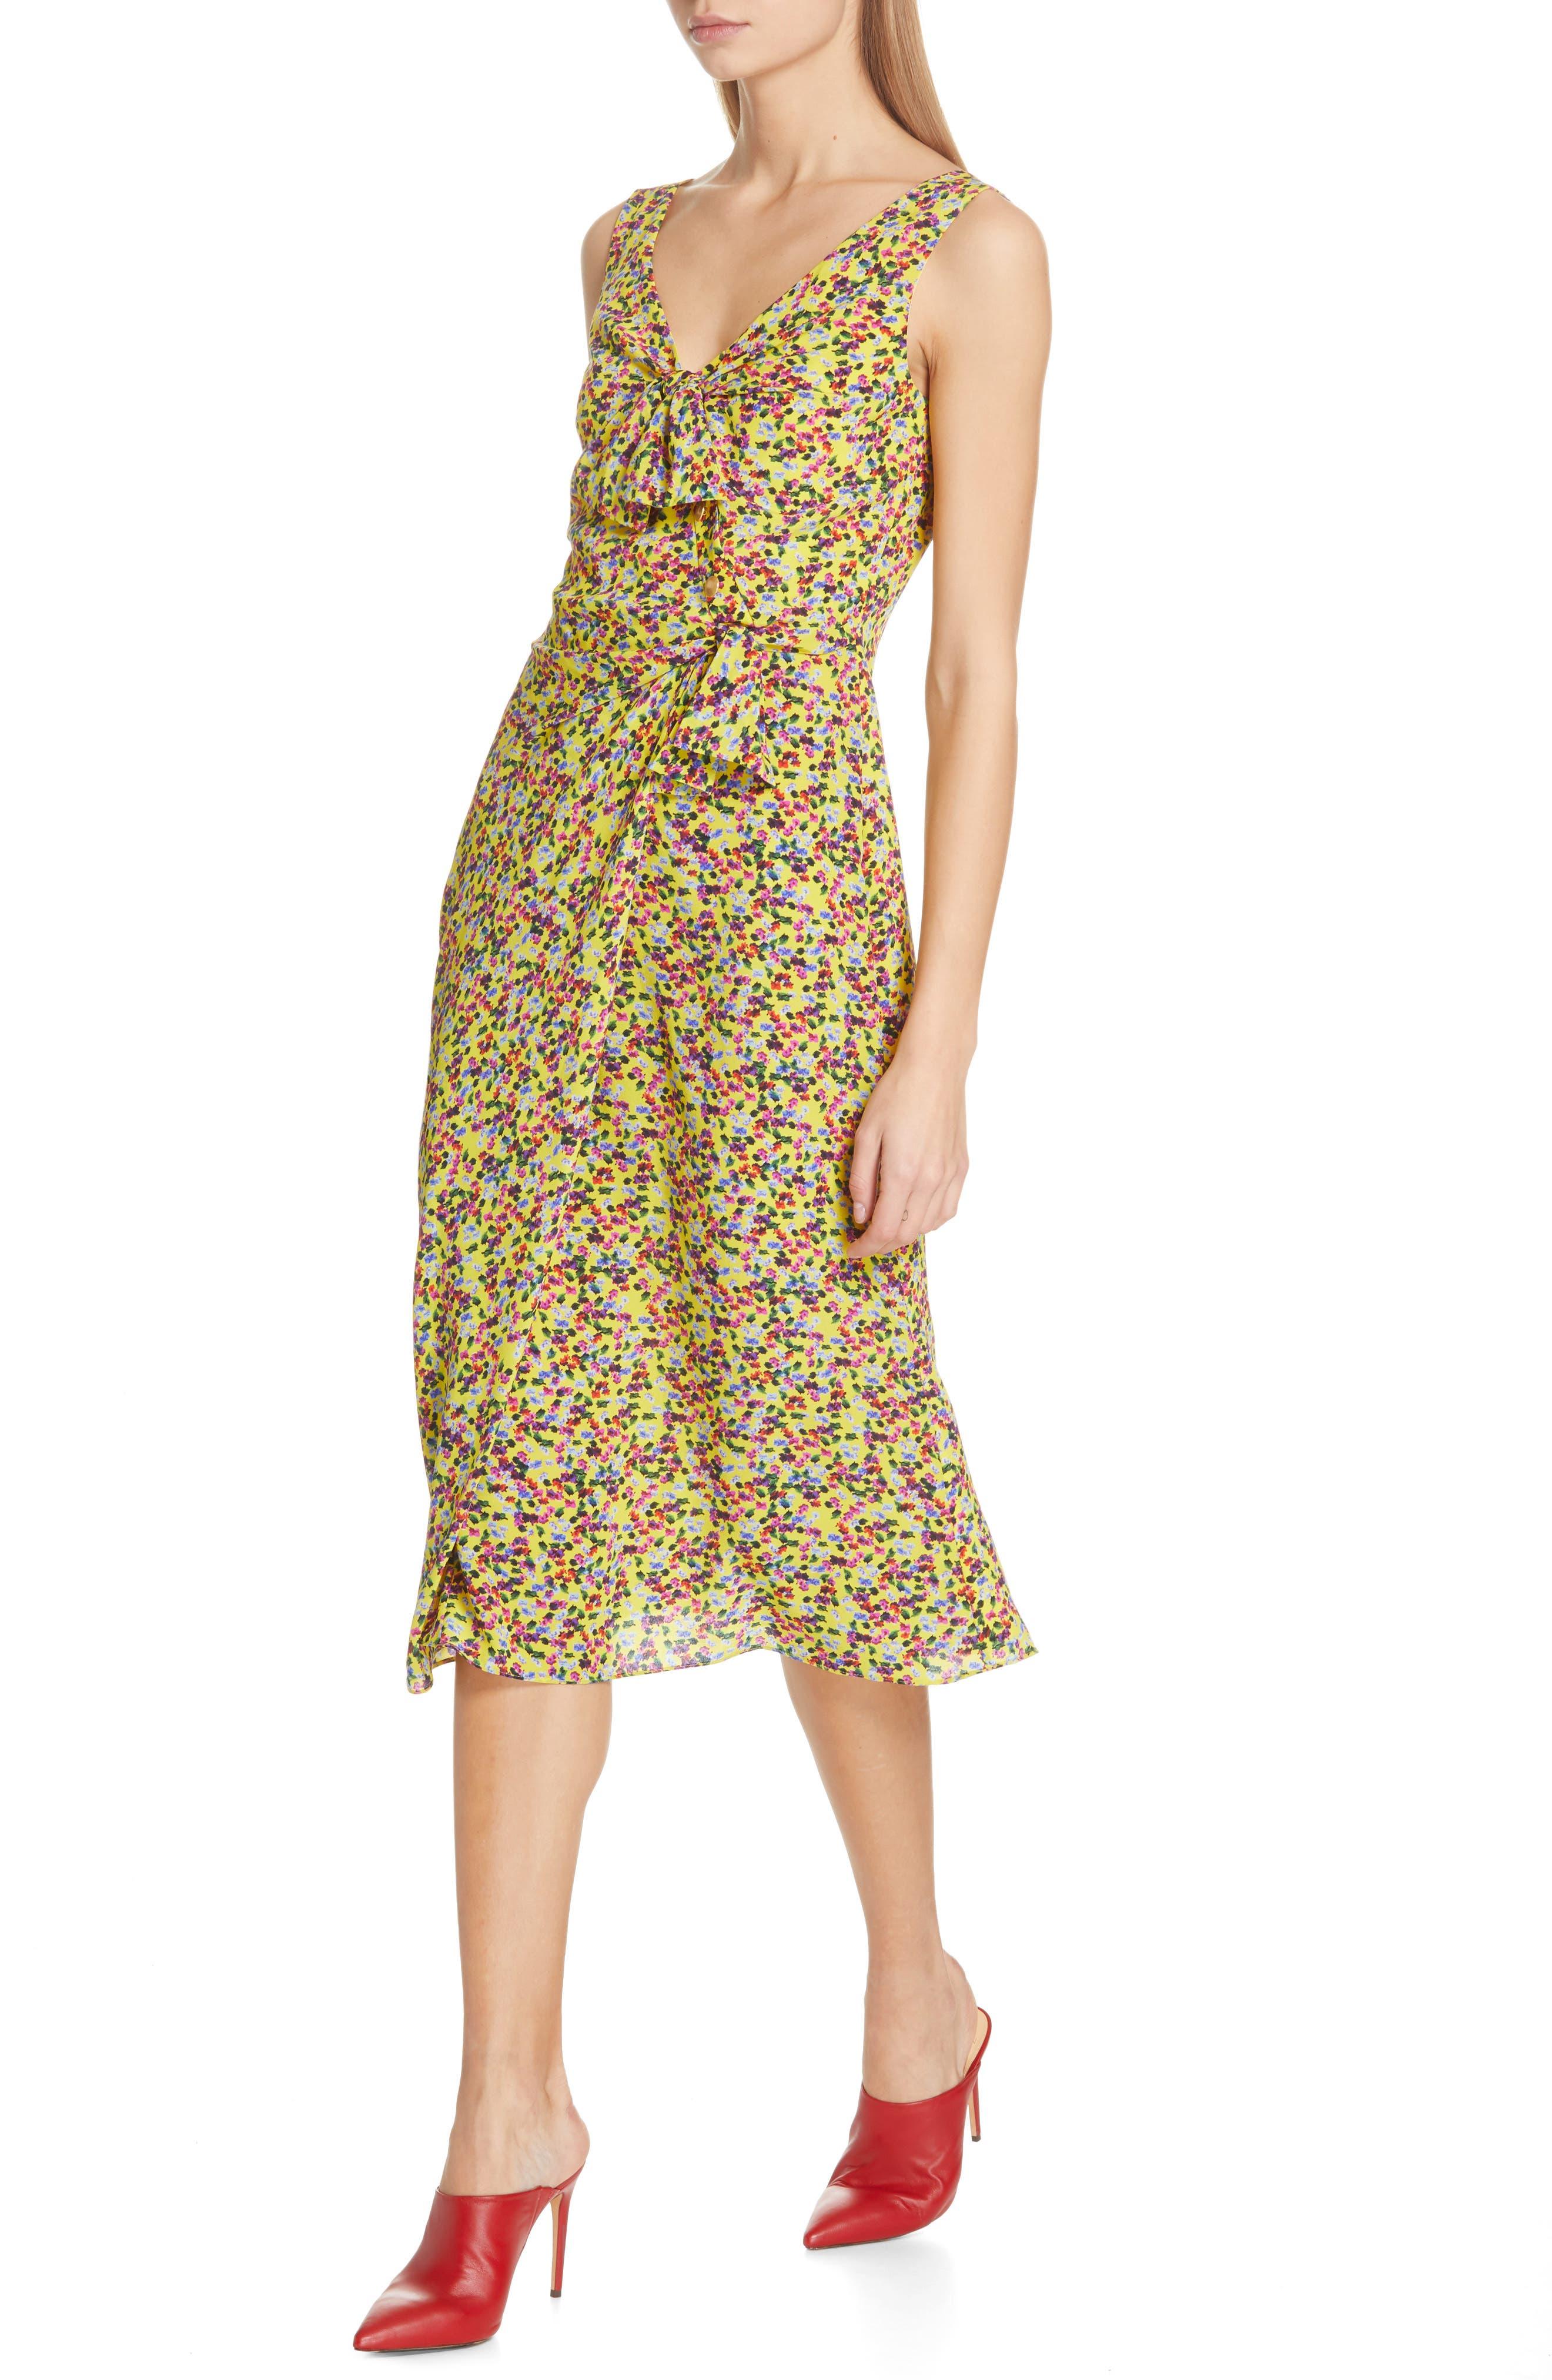 SALONI, Penelope Floral Print Silk Midi Dress, Alternate thumbnail 4, color, YELLOW GARDENIA